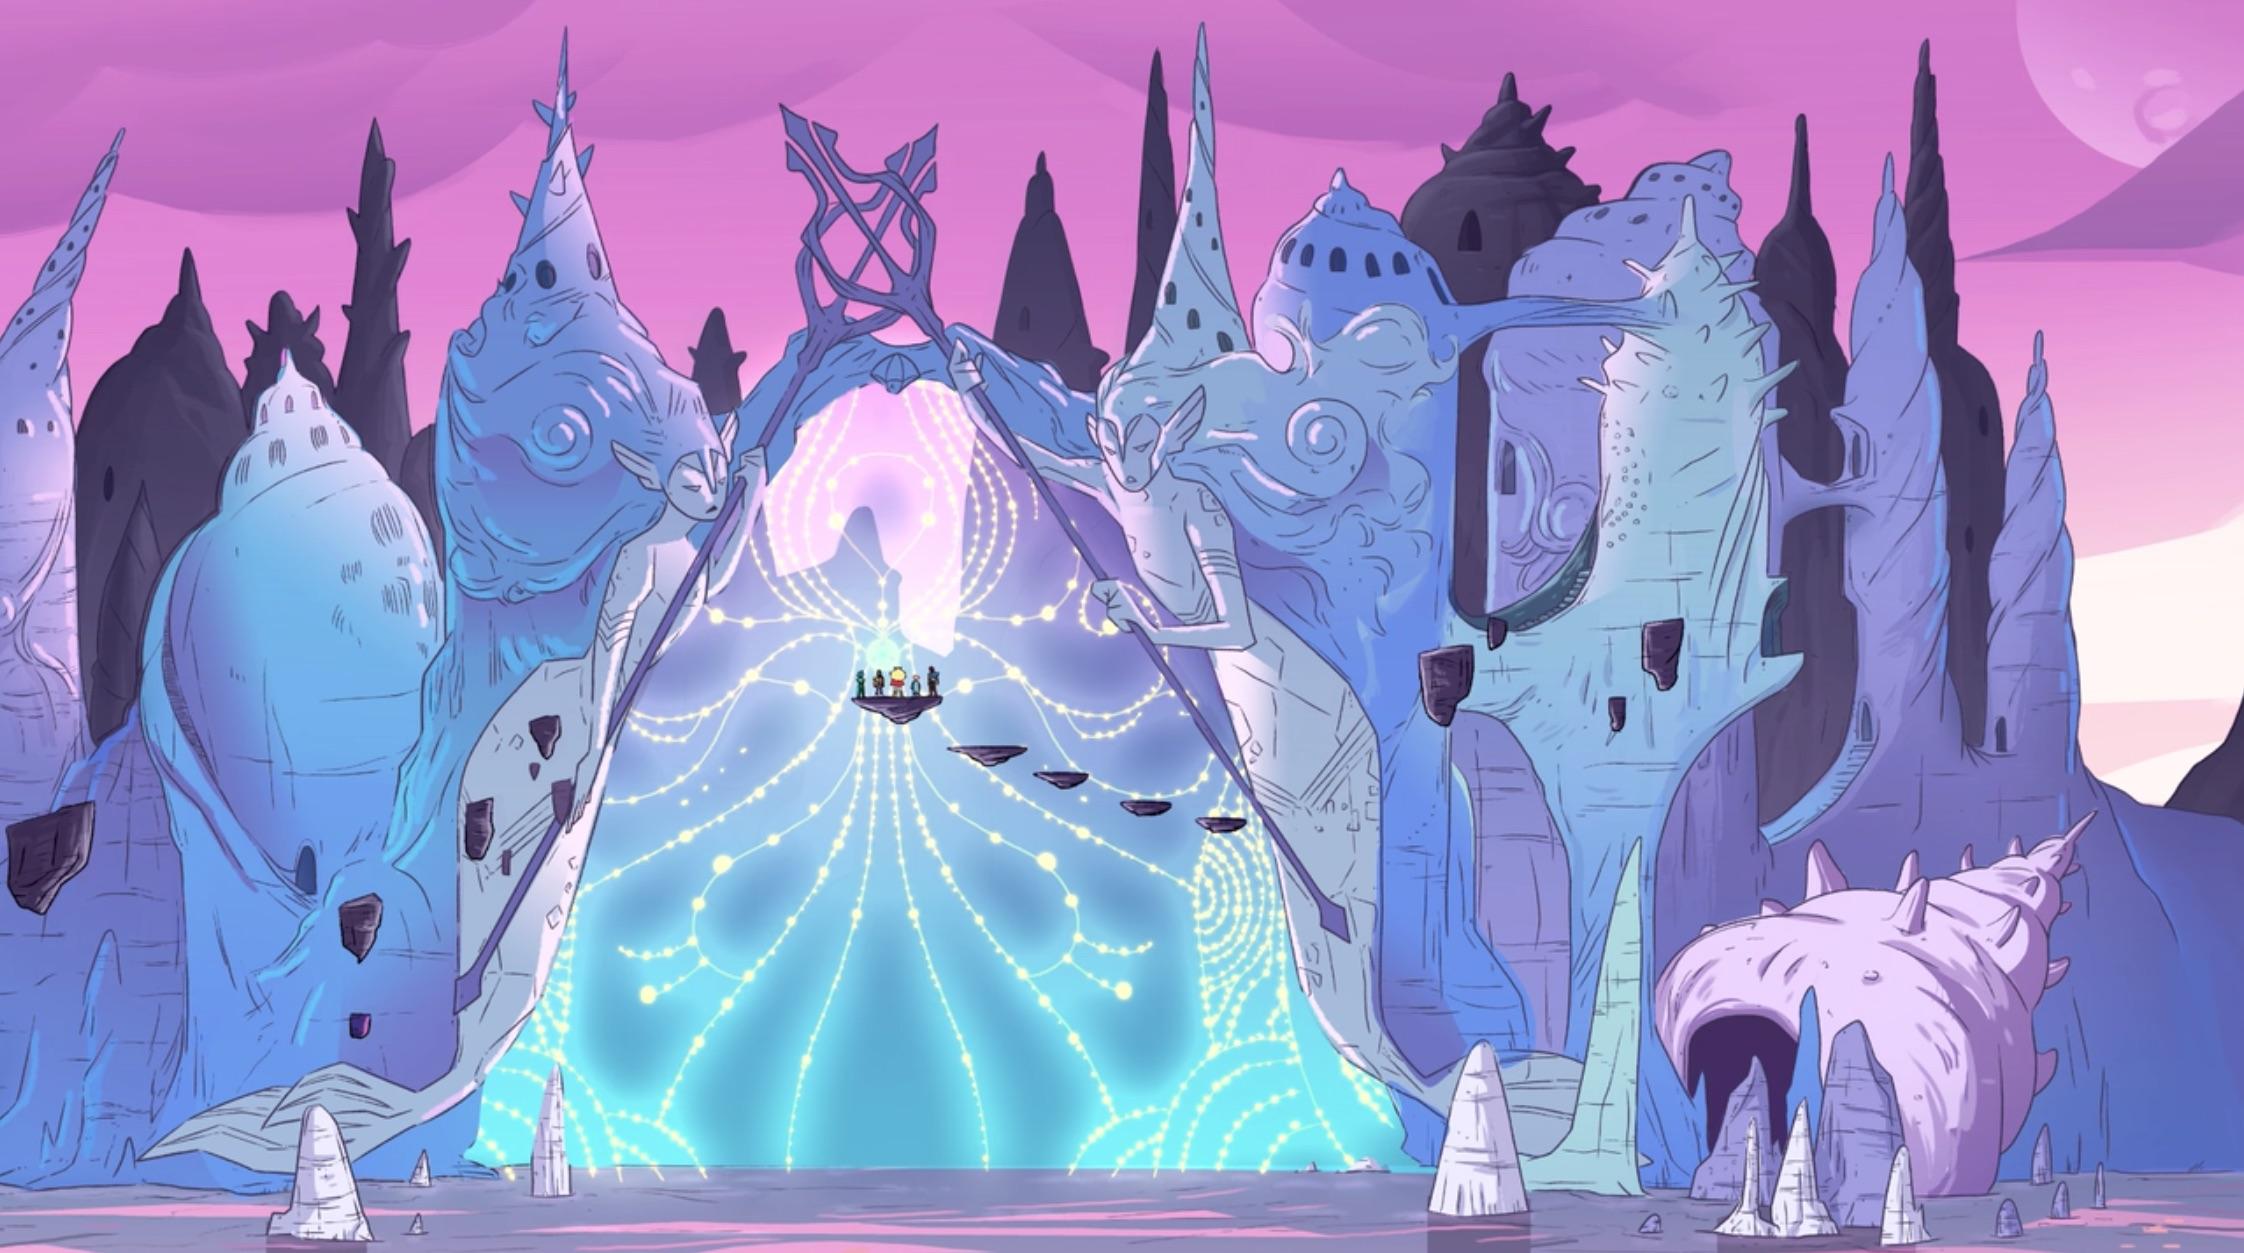 Salineas (She-Ra and the Princesses of Power)